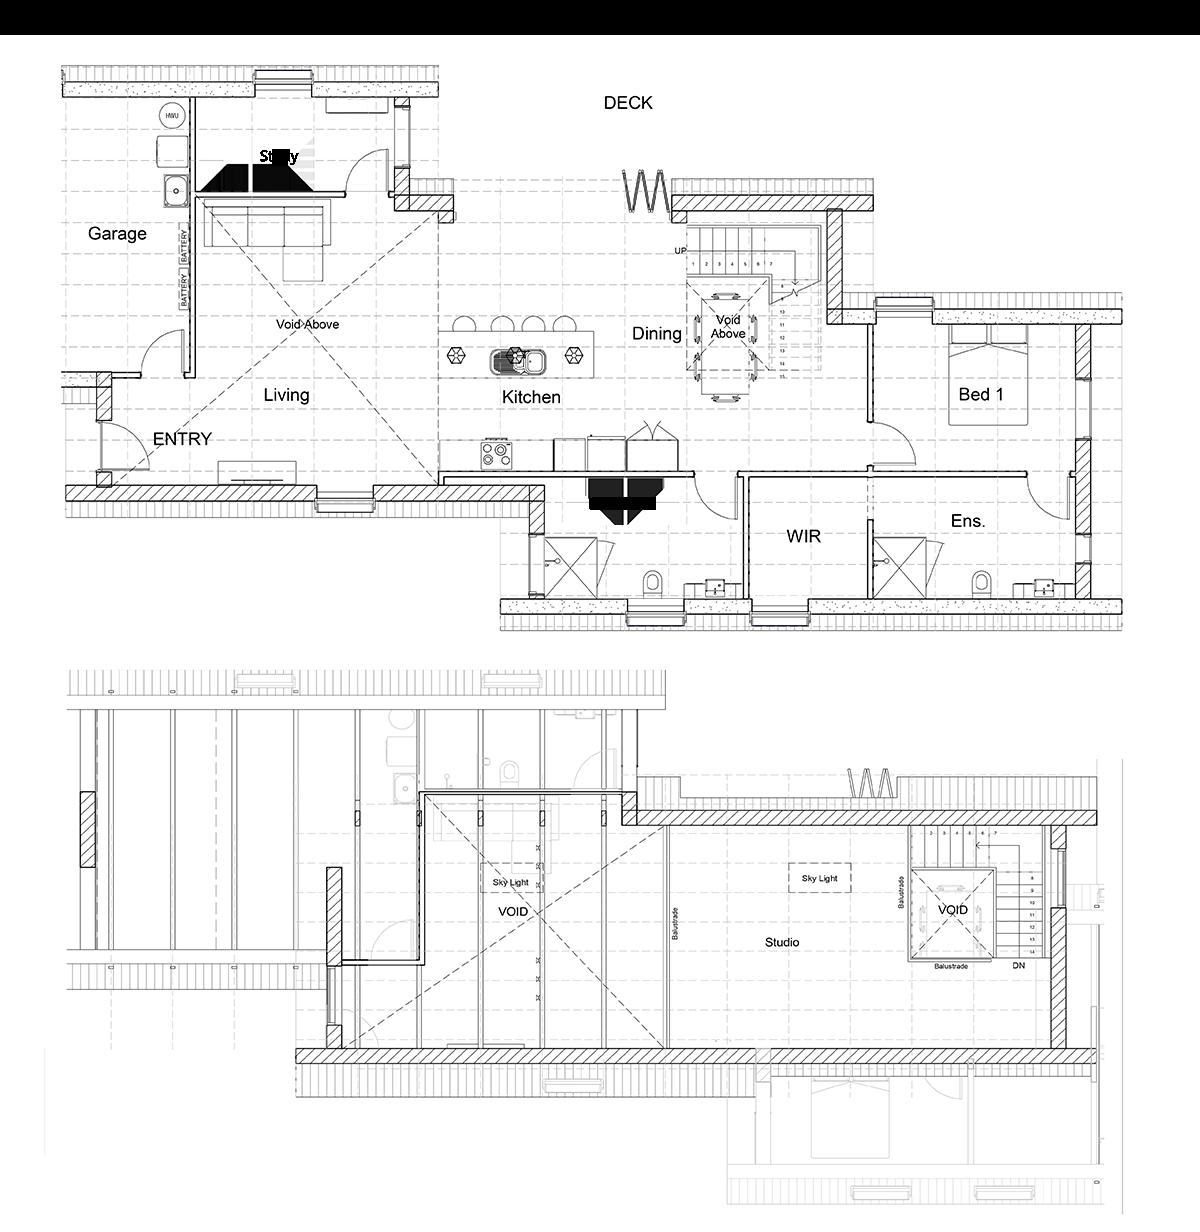 ambition floorplan and design